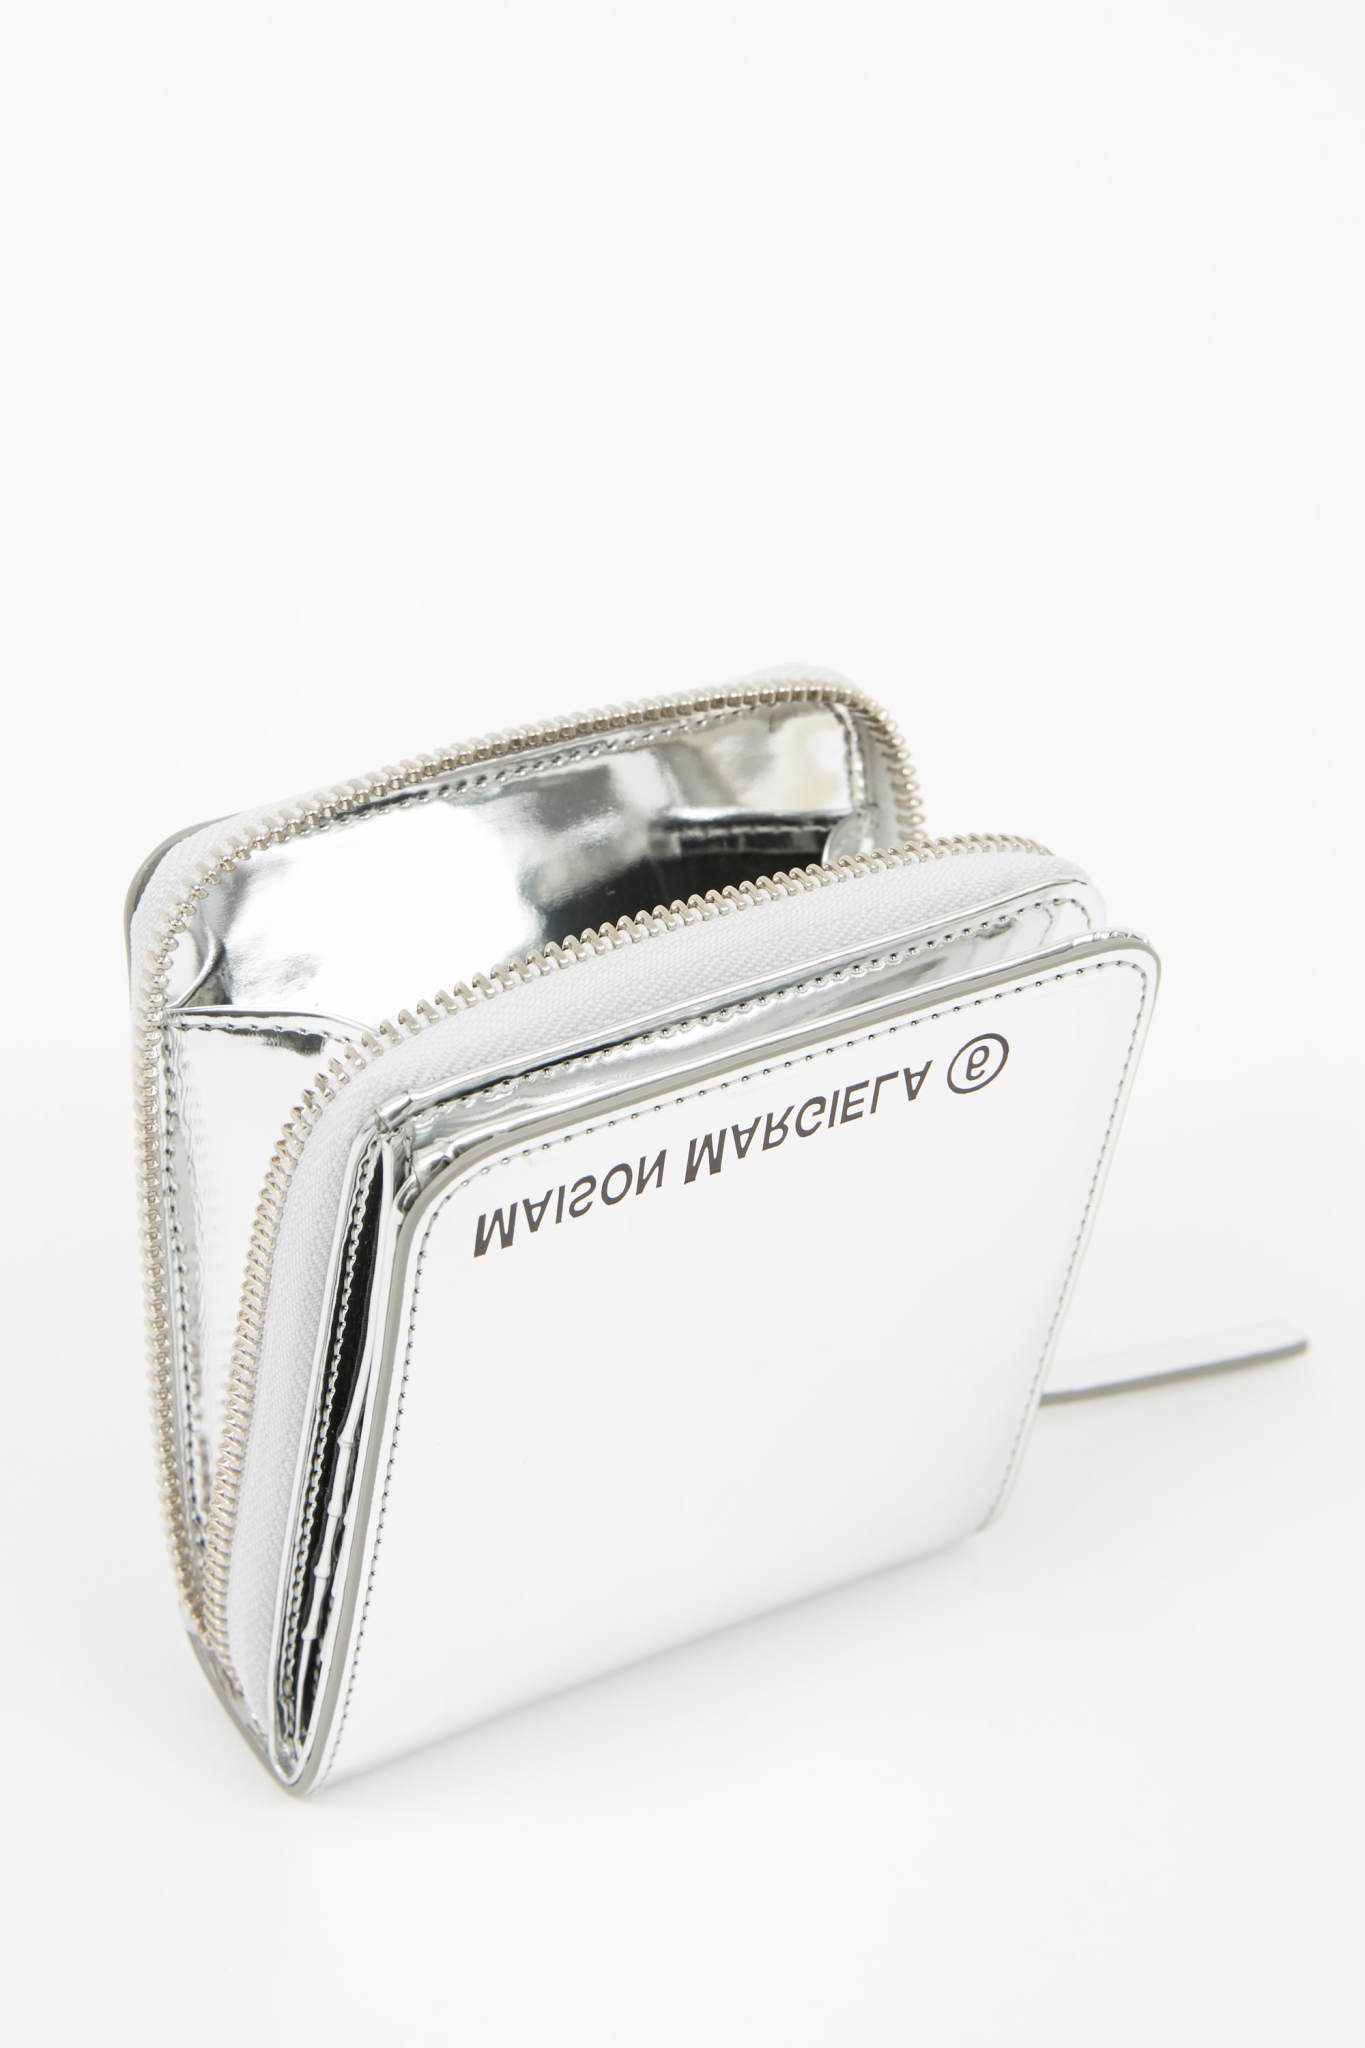 MM6 MAISON MARGIELA Metallic Silver Zip Logo Wallet